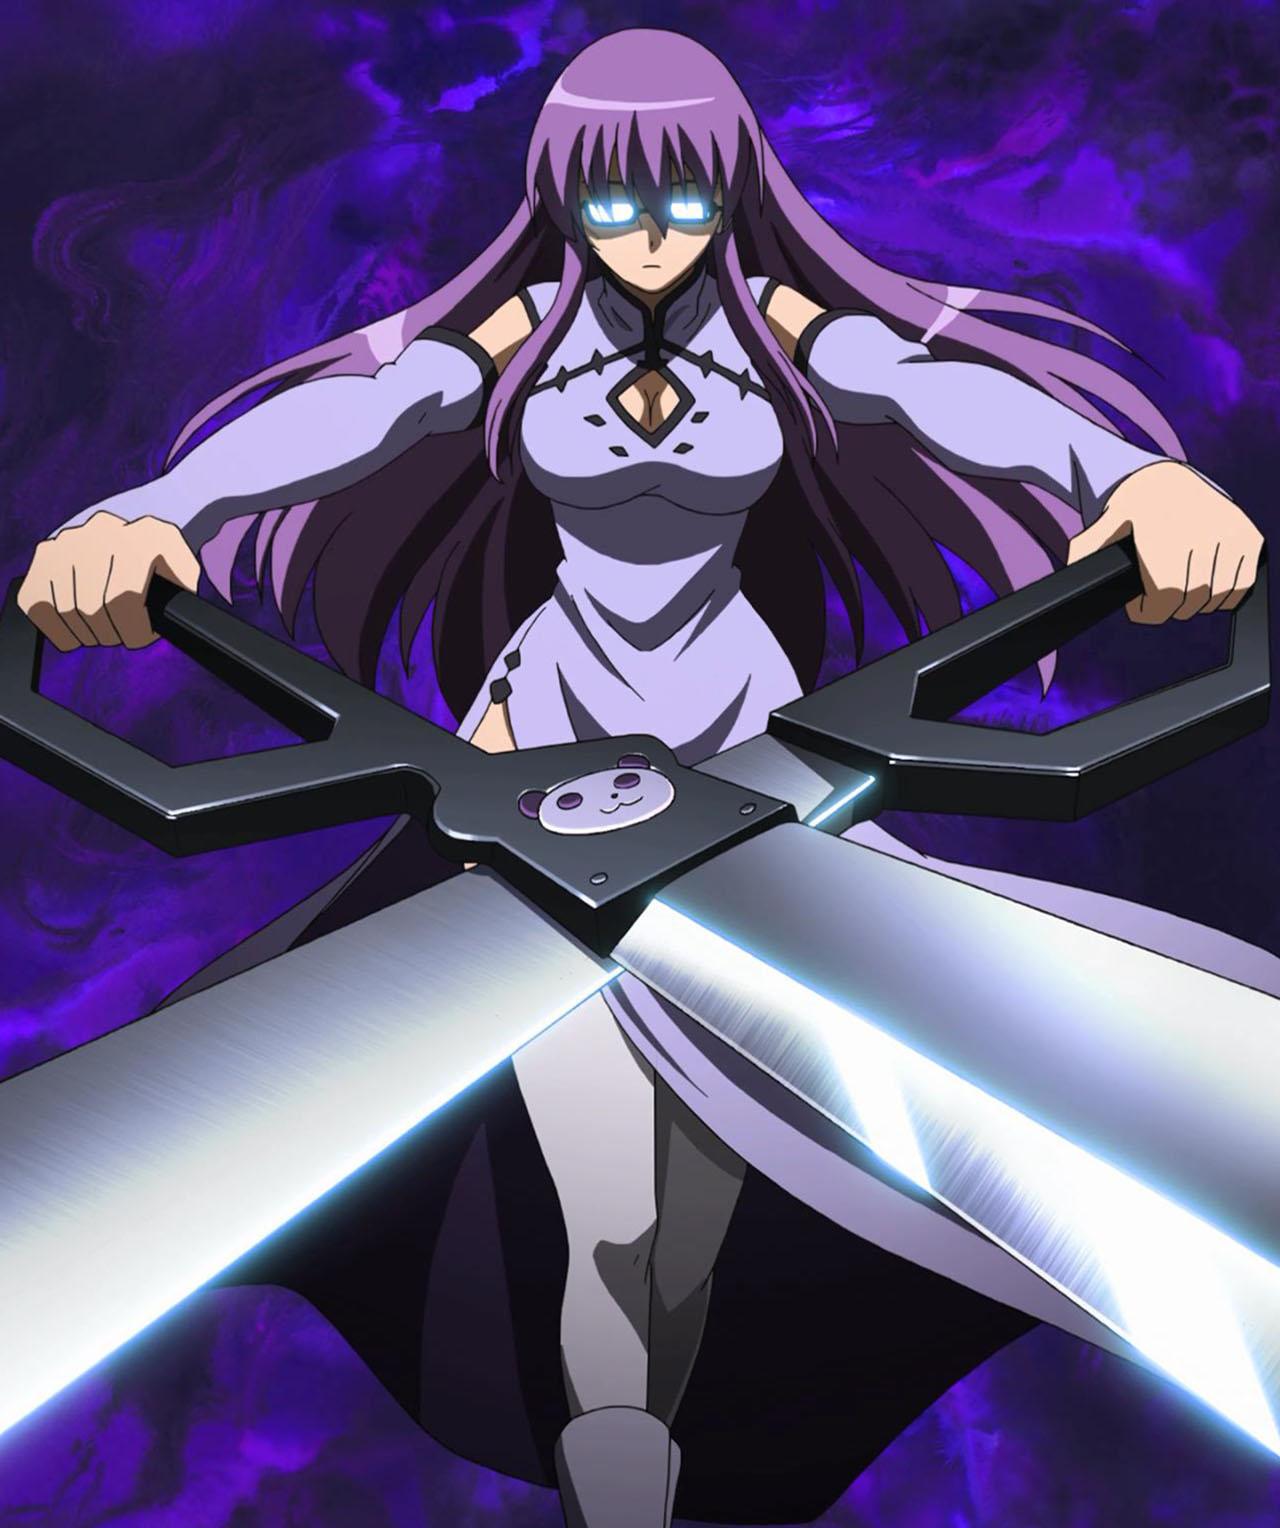 Image - 773190-akame ga kill 04 large 15.jpg - Heroes Wiki